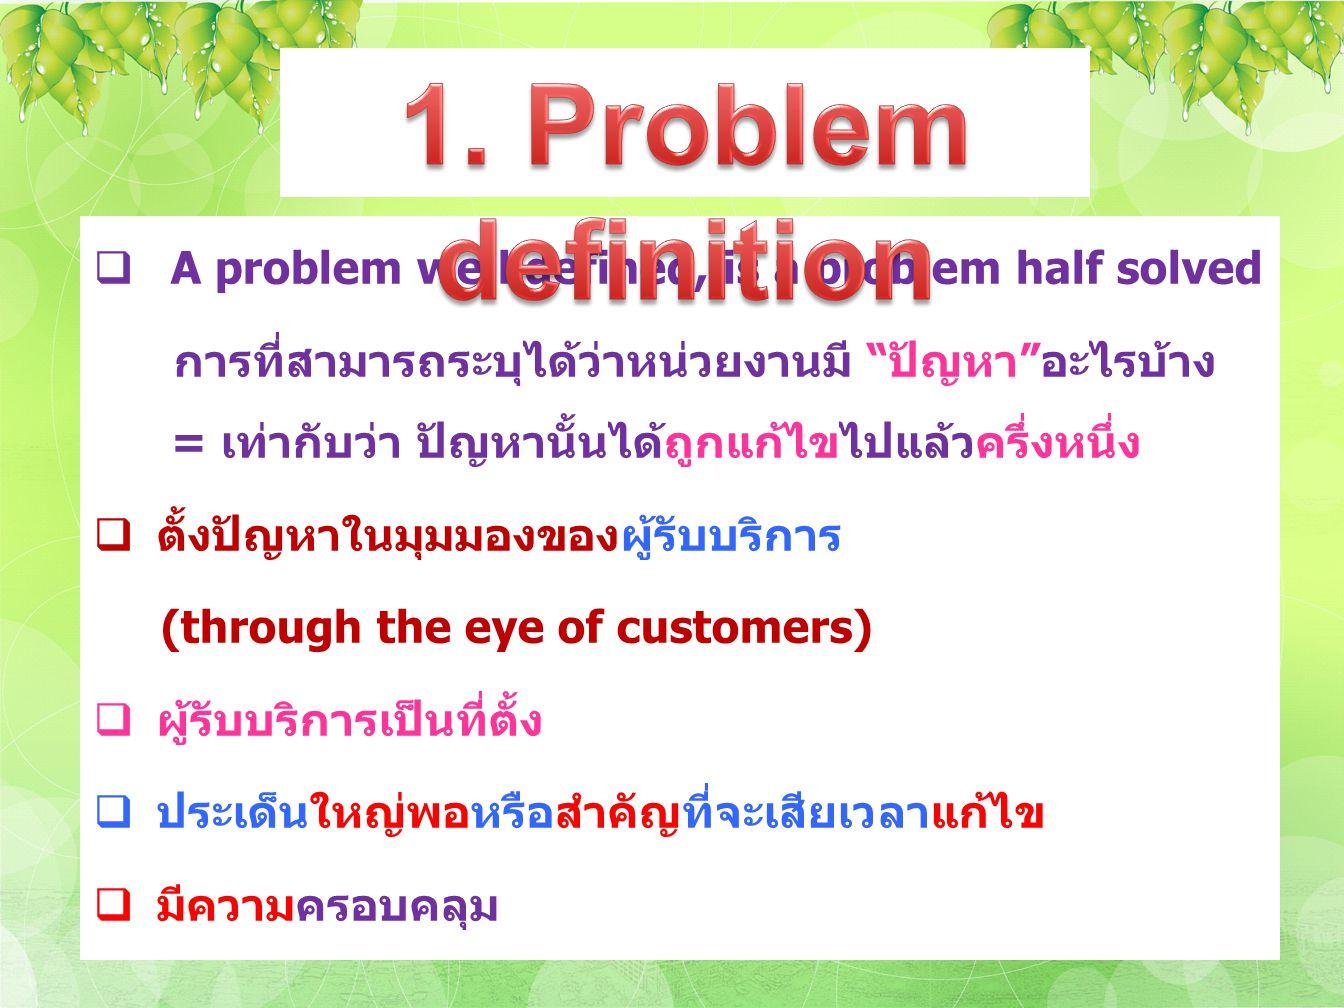 " A problem well defined, is a problem half solved การที่สามารถระบุได้ว่าหน่วยงานมี ""ปัญหา""อะไรบ้าง = เท่ากับว่า ปัญหานั้นได้ถูกแก้ไขไปแล้วครึ่งหนึ่ง"